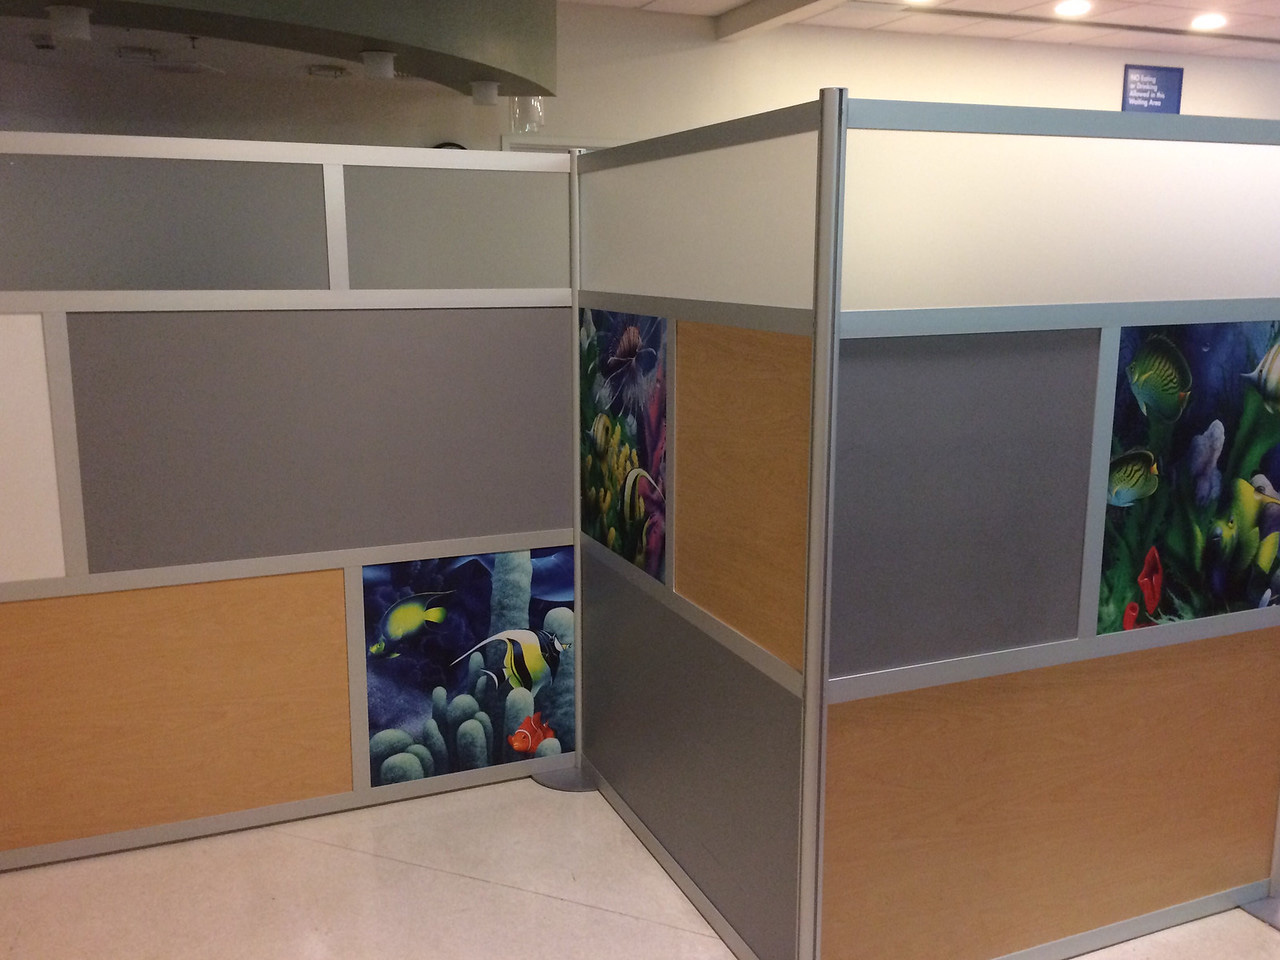 furniture-cubicles-in-daytona-beach-florida-3-.jpg